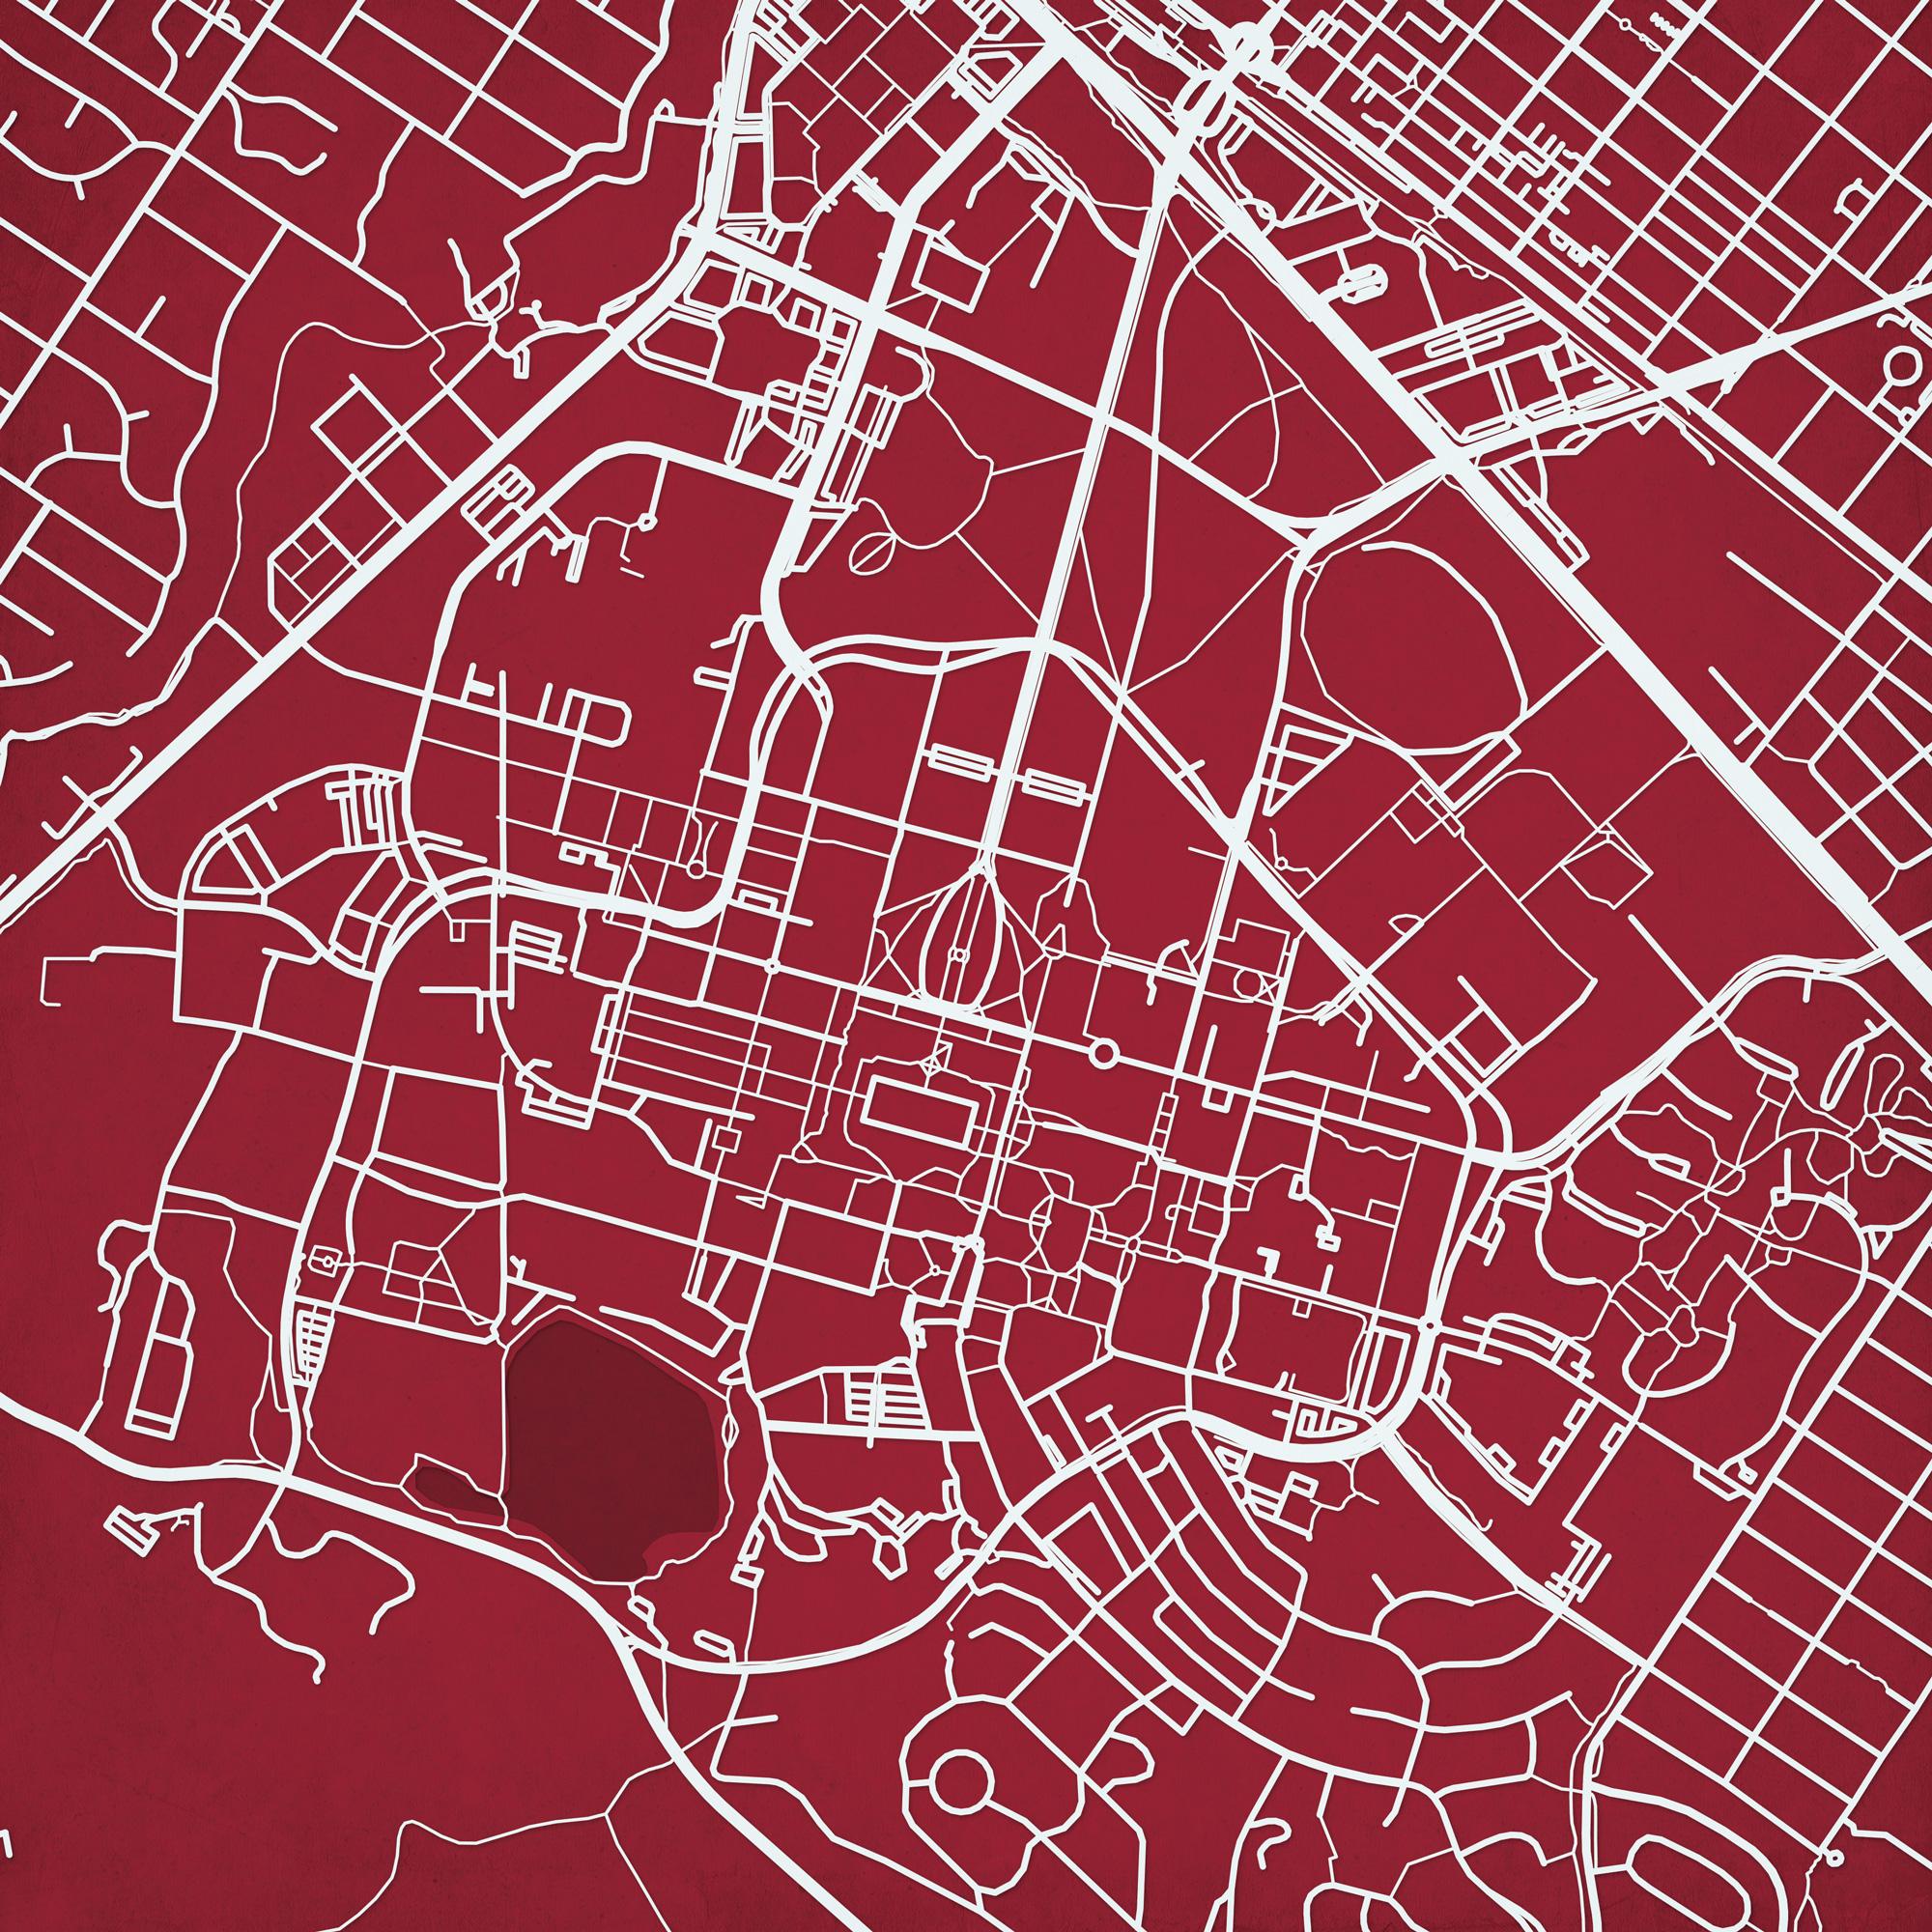 Stanford University Campus Map Art - City Prints